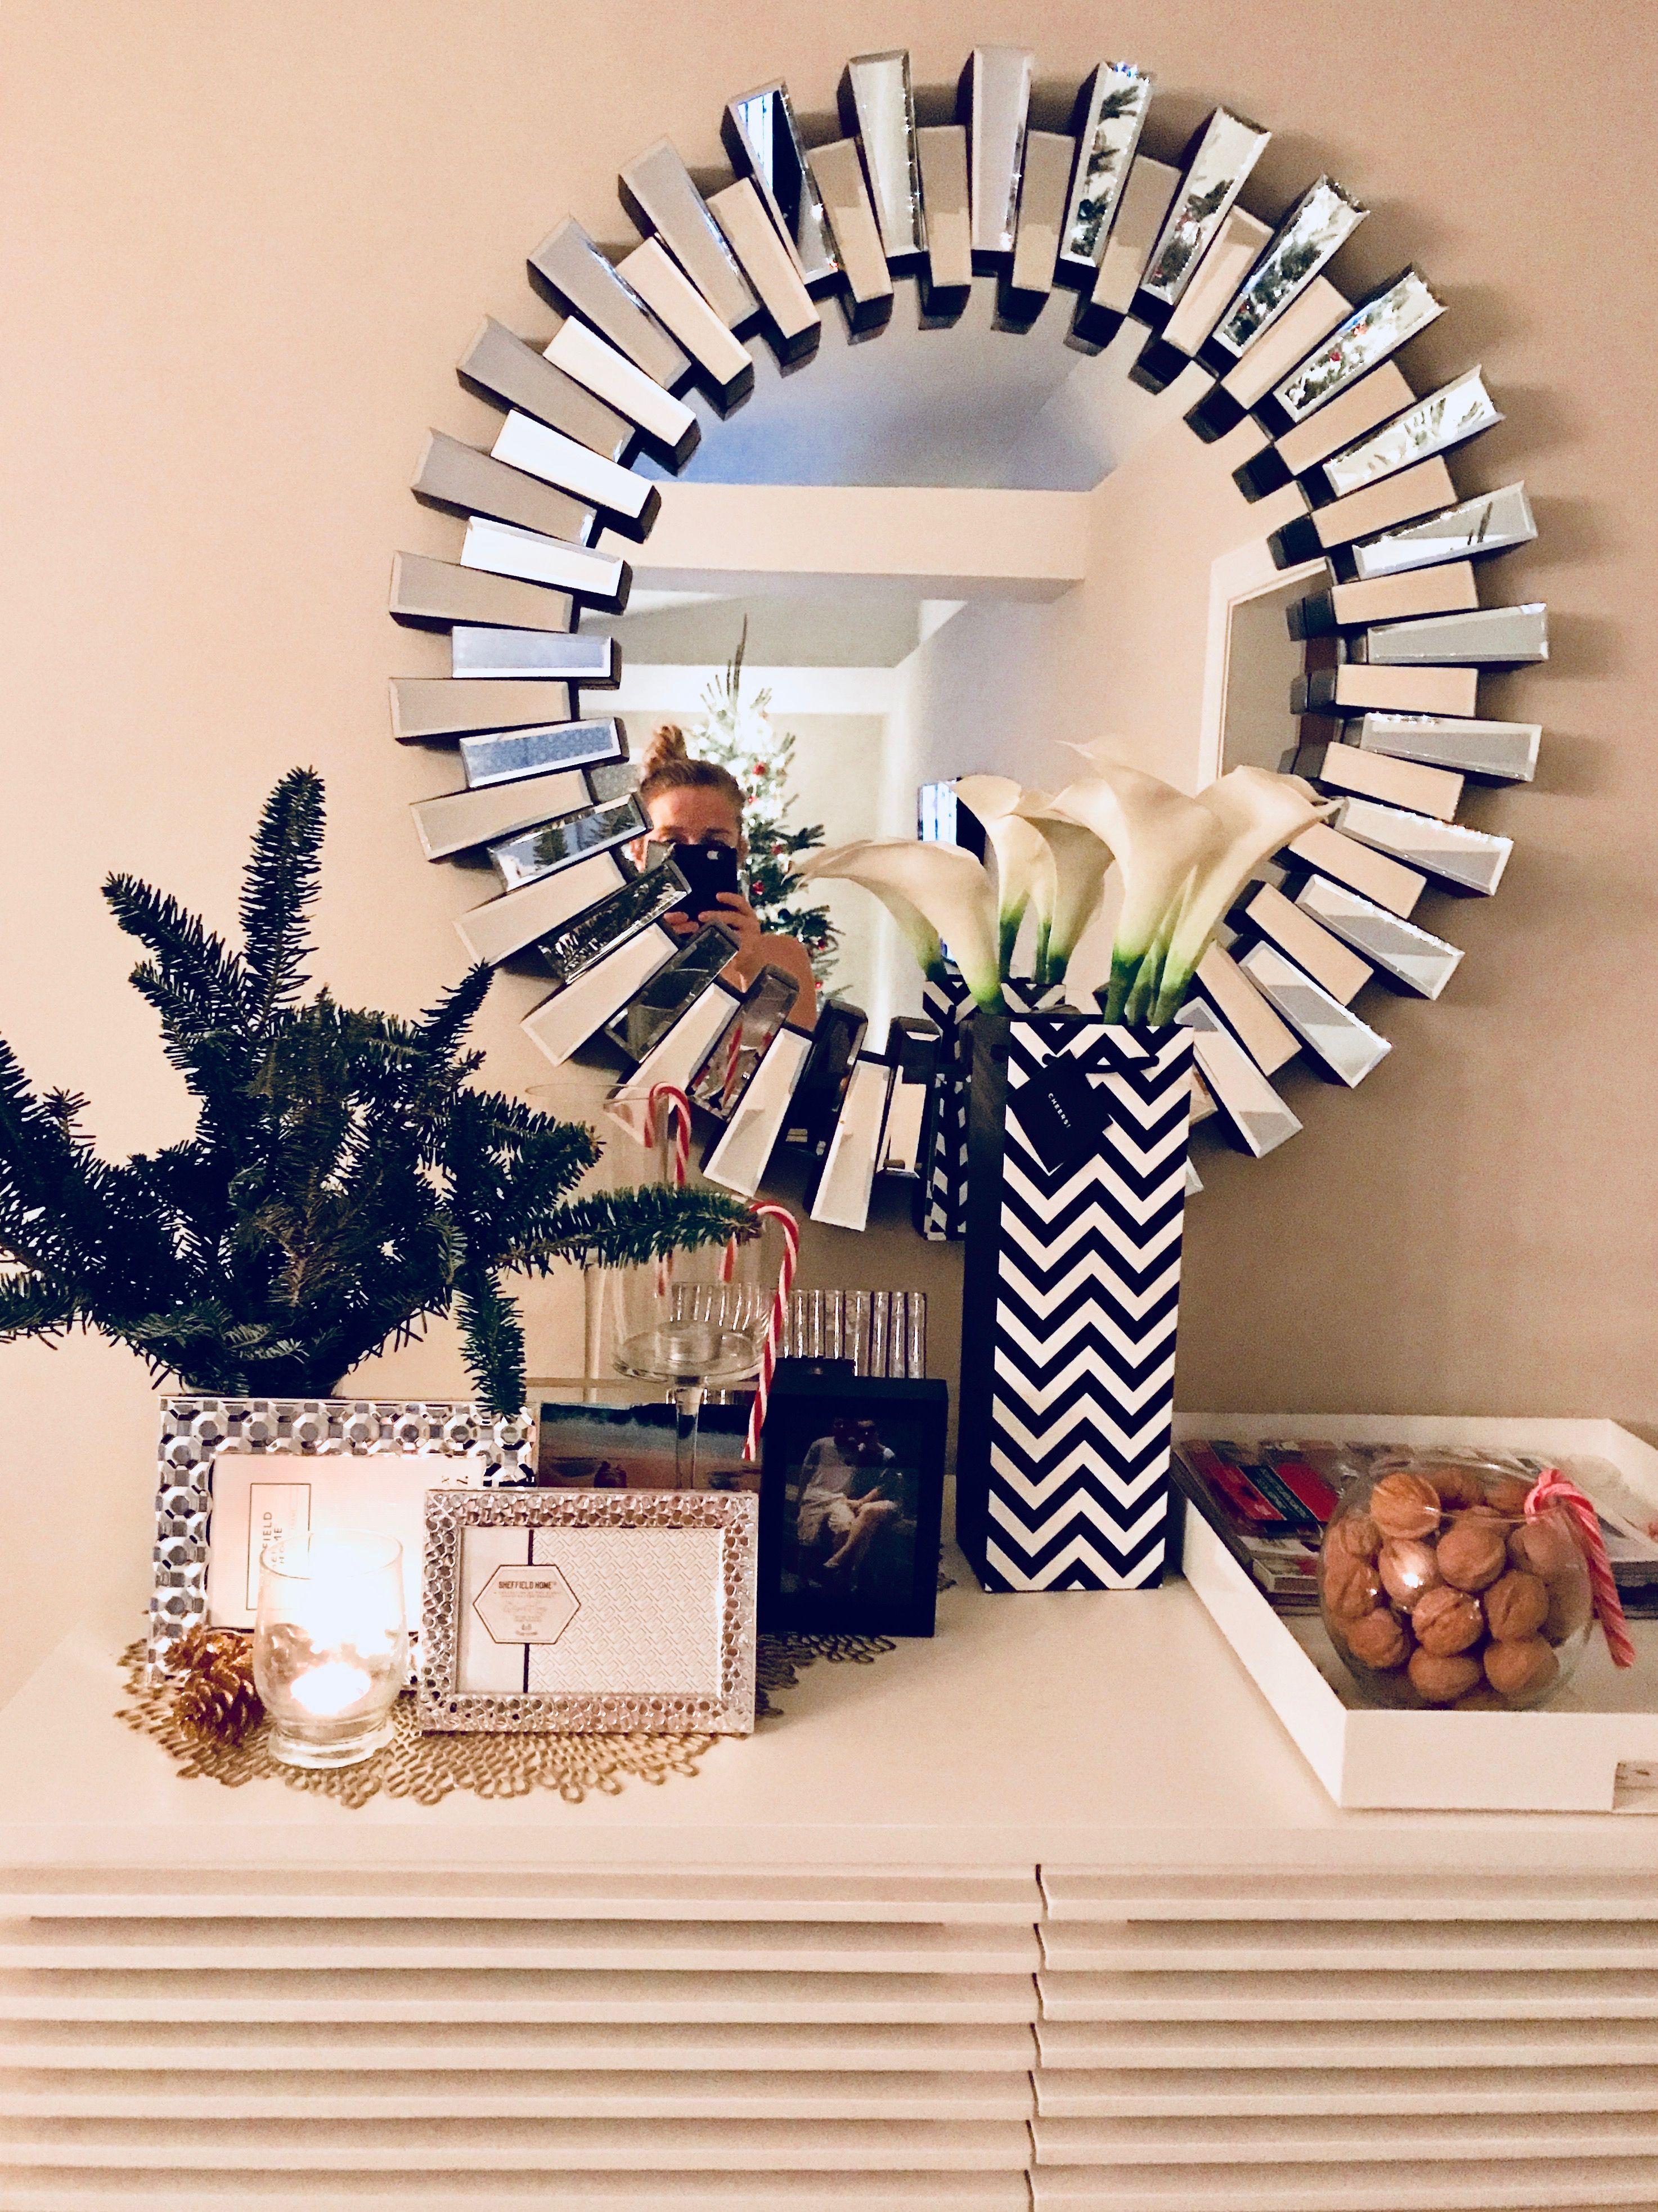 Tahari Circular Accent Mirror Interior Spaces In 2019 Mirror Tahari Home Mirror Shapes